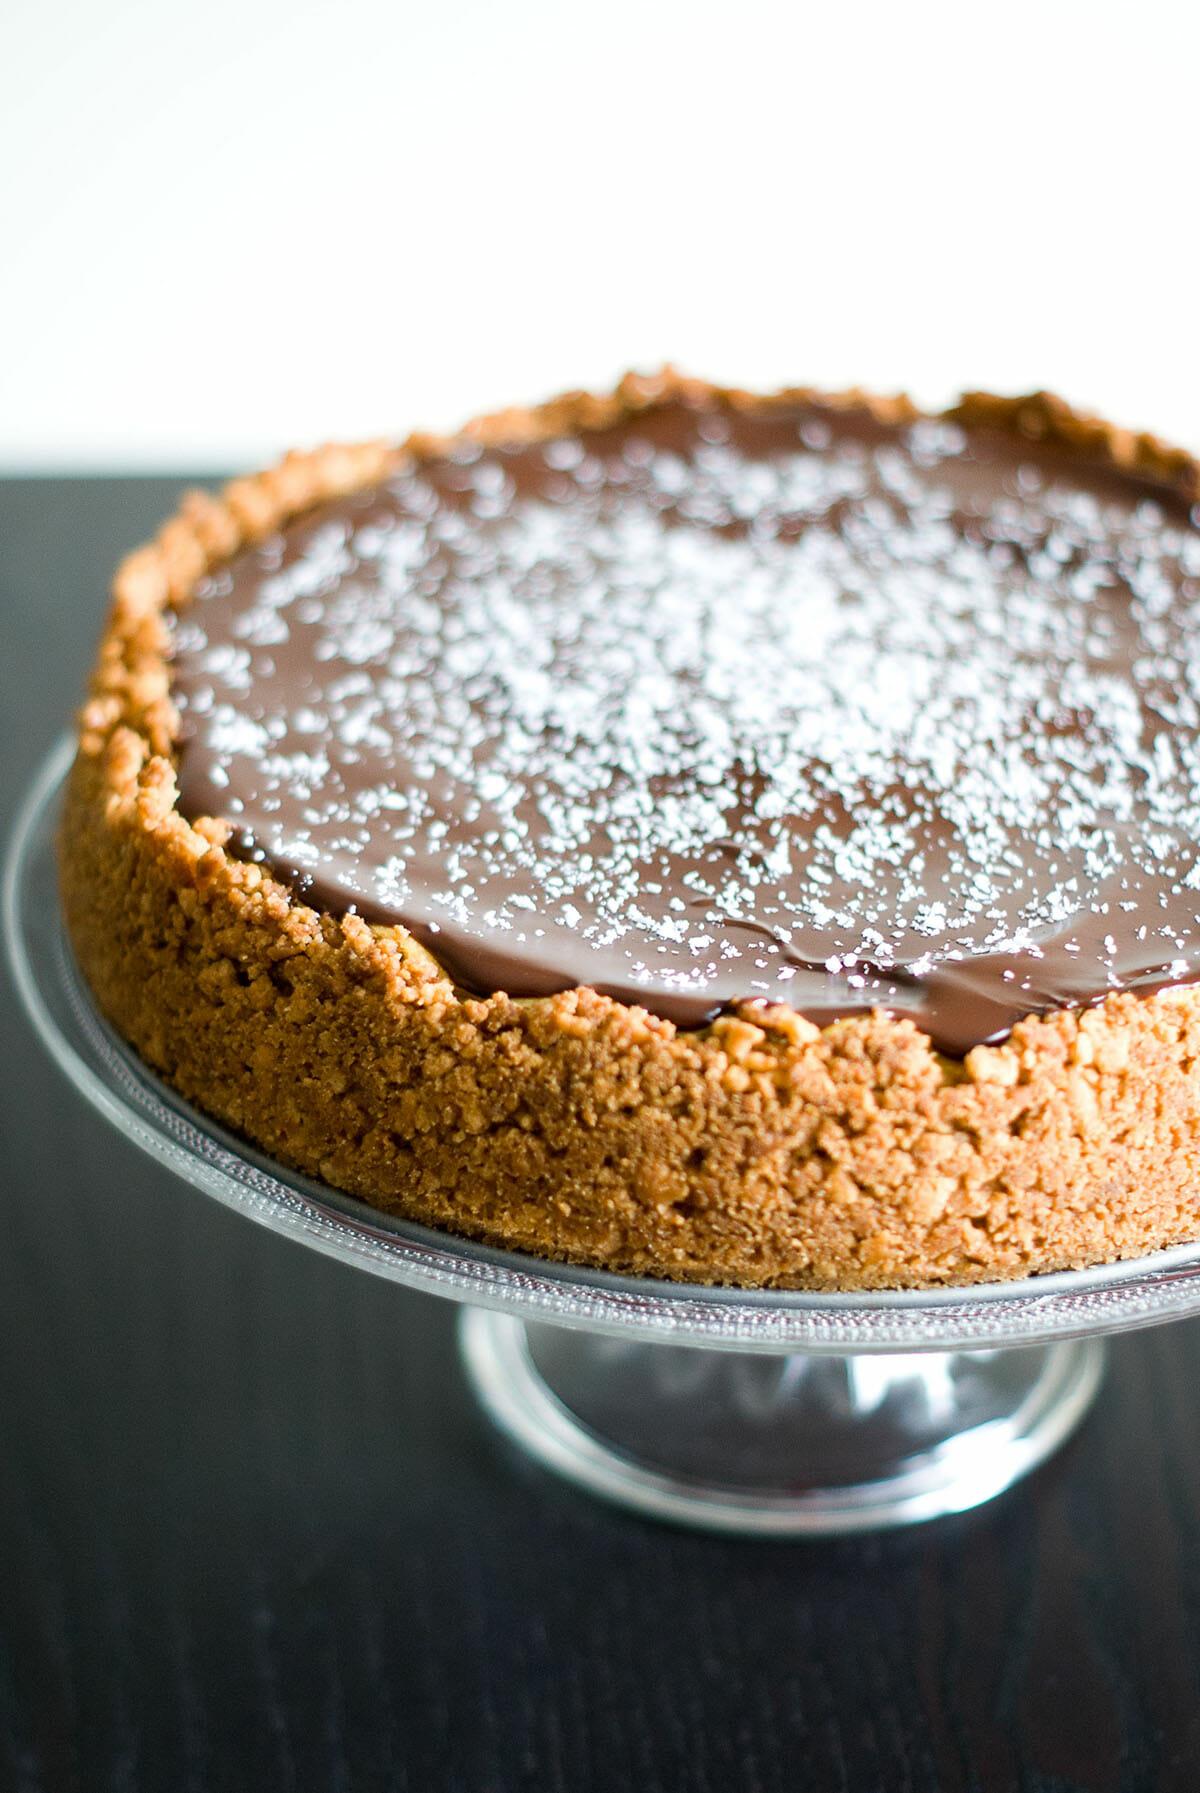 Cheesecake Noix De Coco Amp Chocolat Noir Lilie Bakery